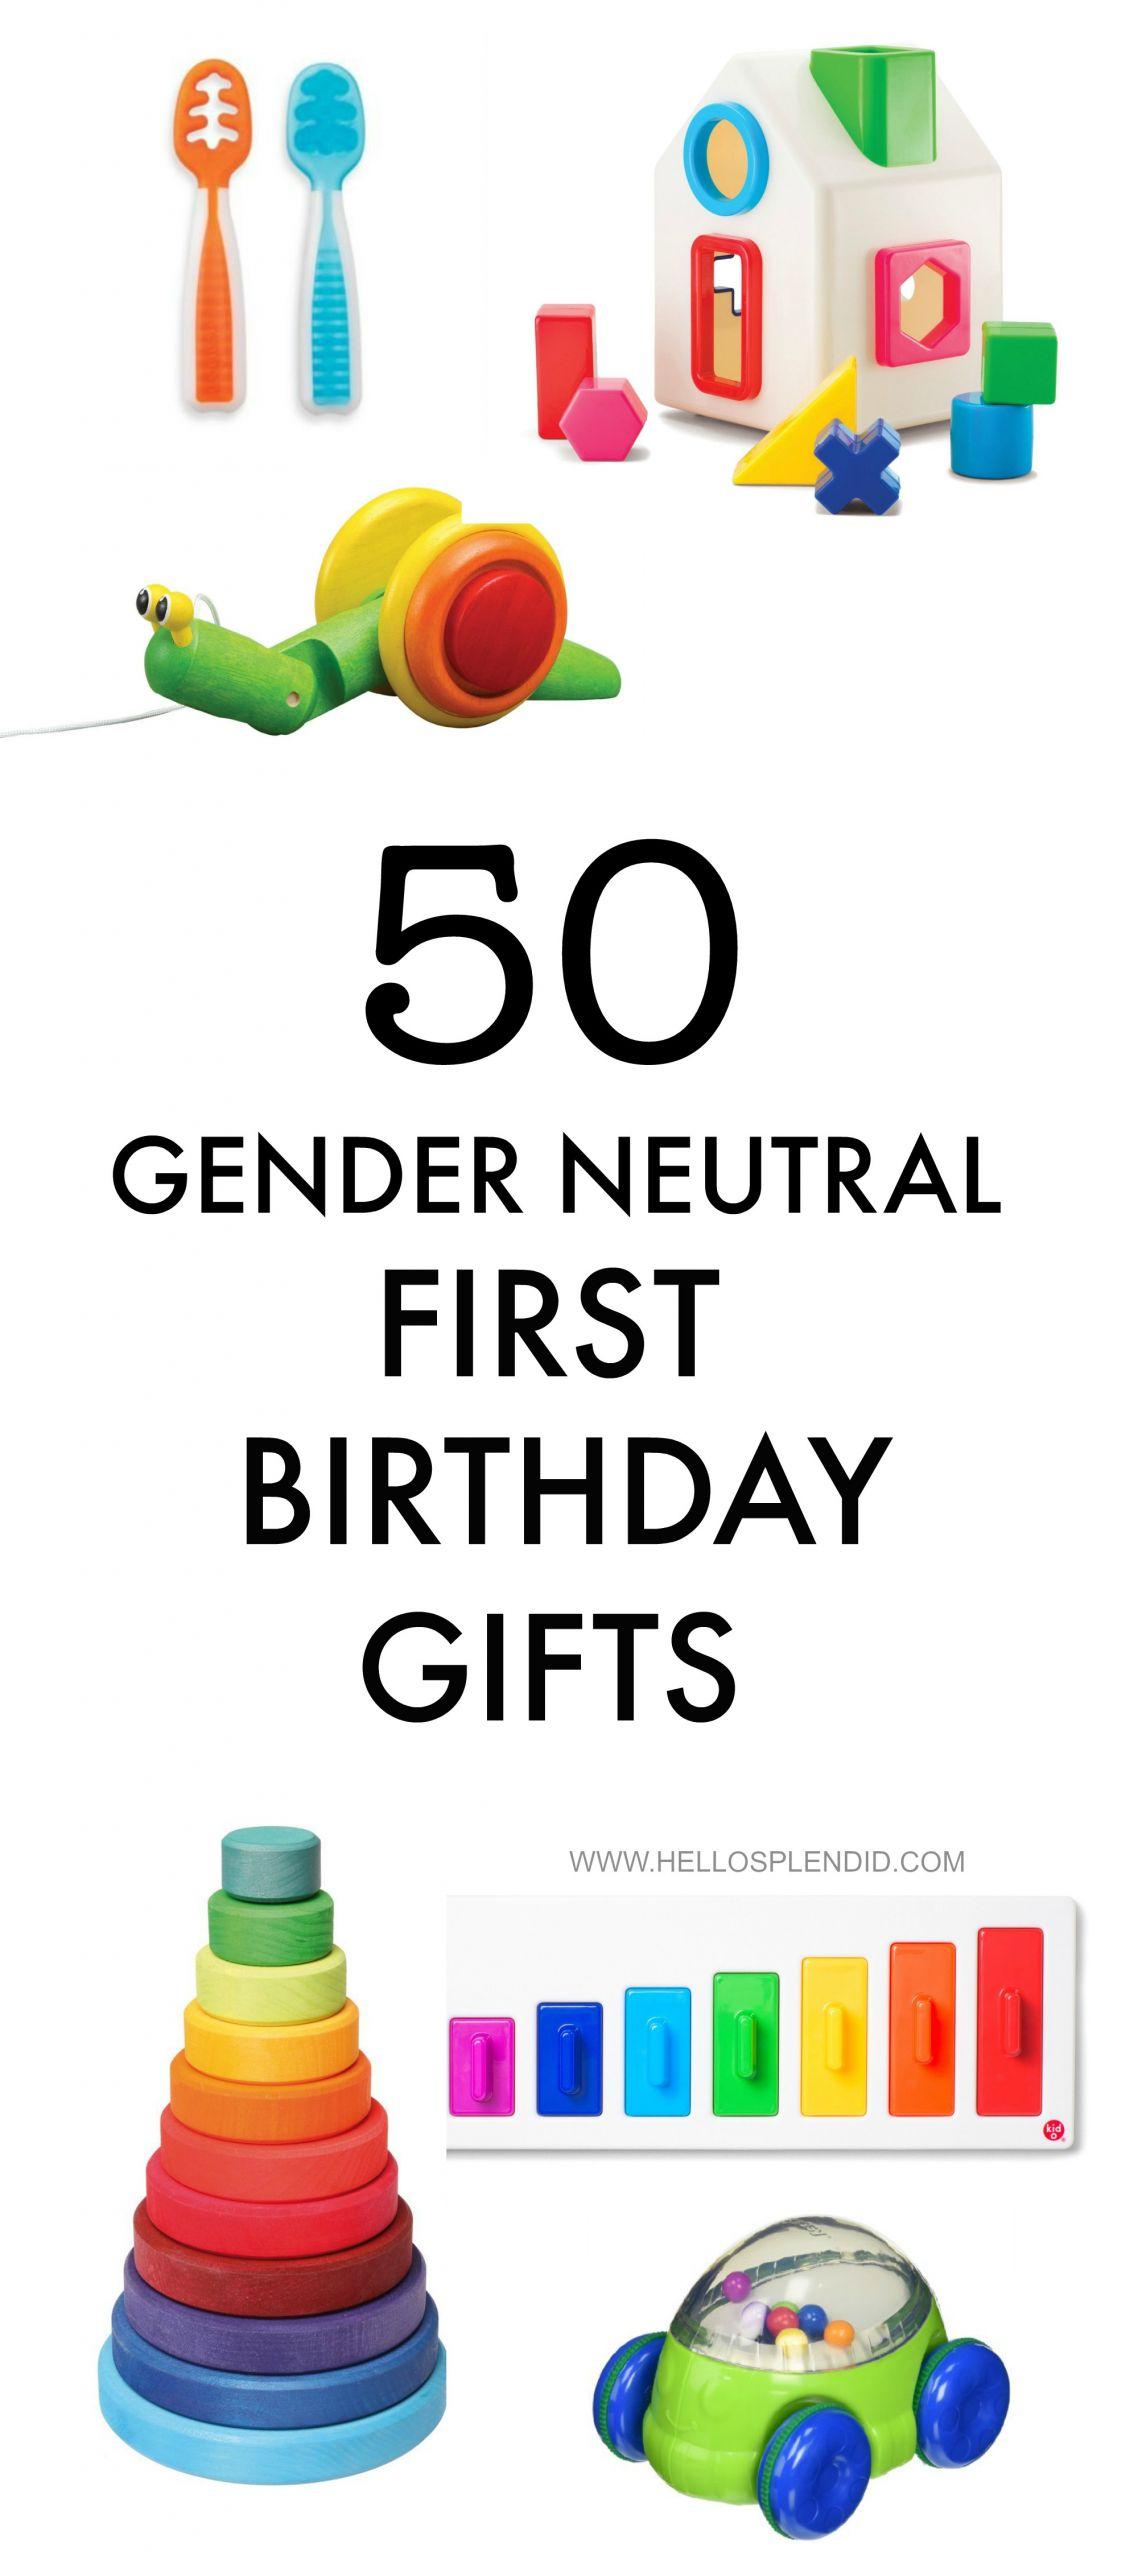 Gift Ideas For Baby First Birthday  50 Gender Neutral First Birthday Gifts Hello Splendid